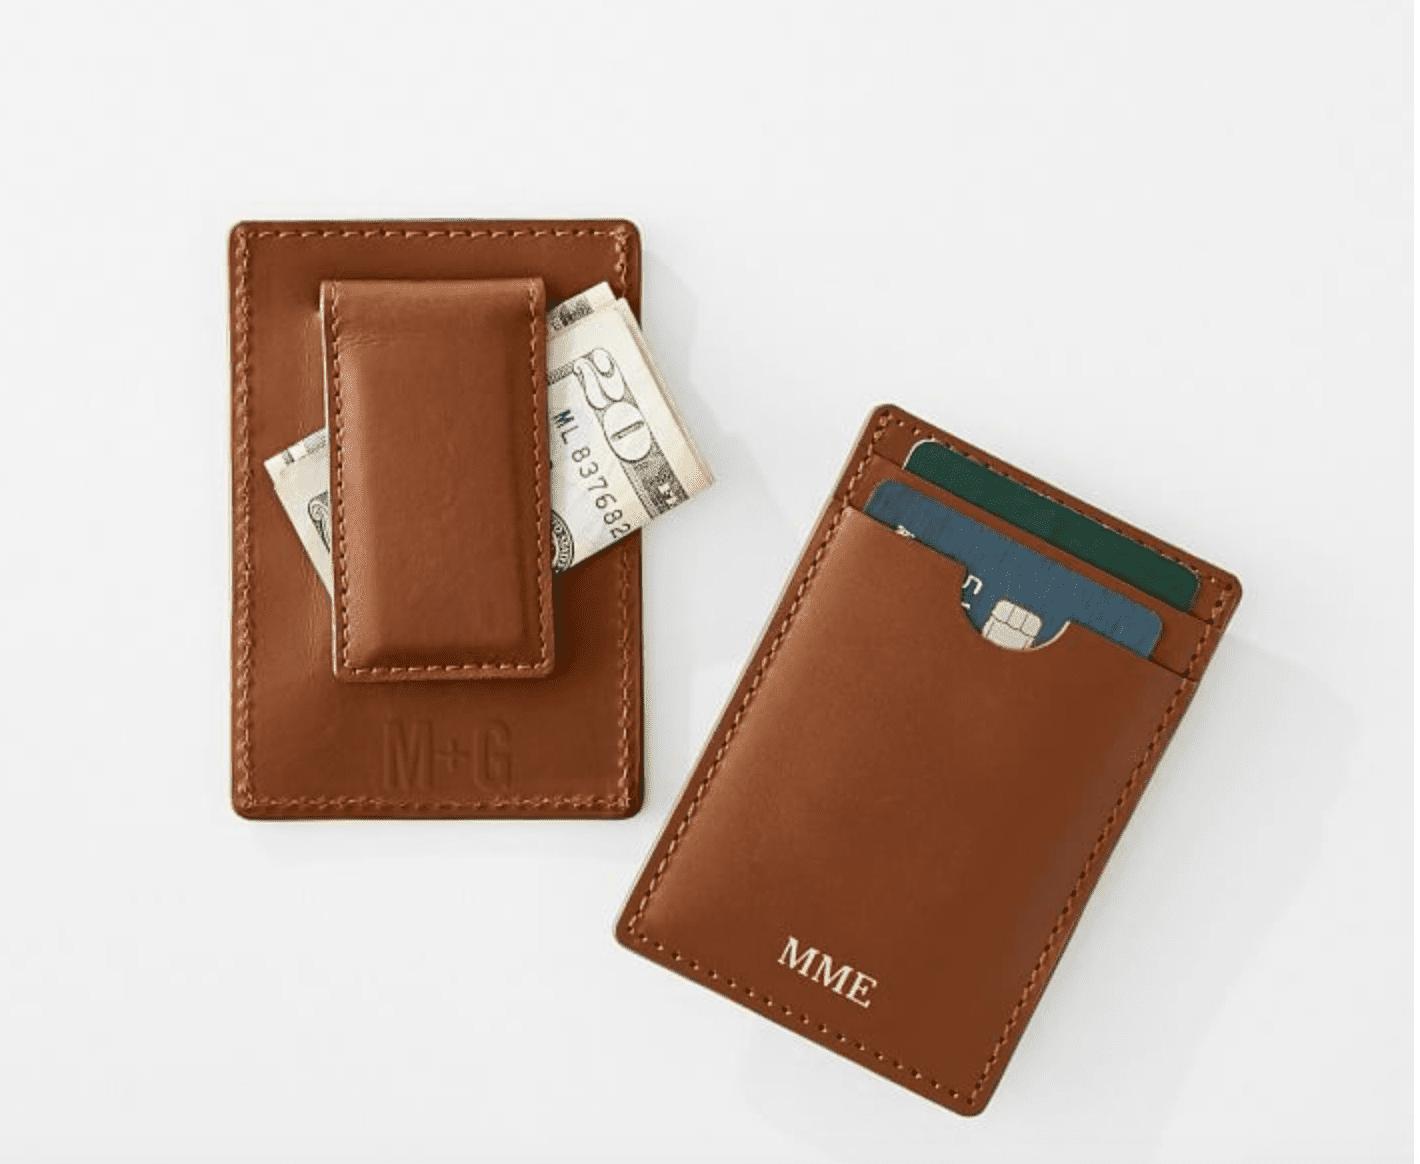 Mark & Graham Monogrammed Leather Money Clip Wallet